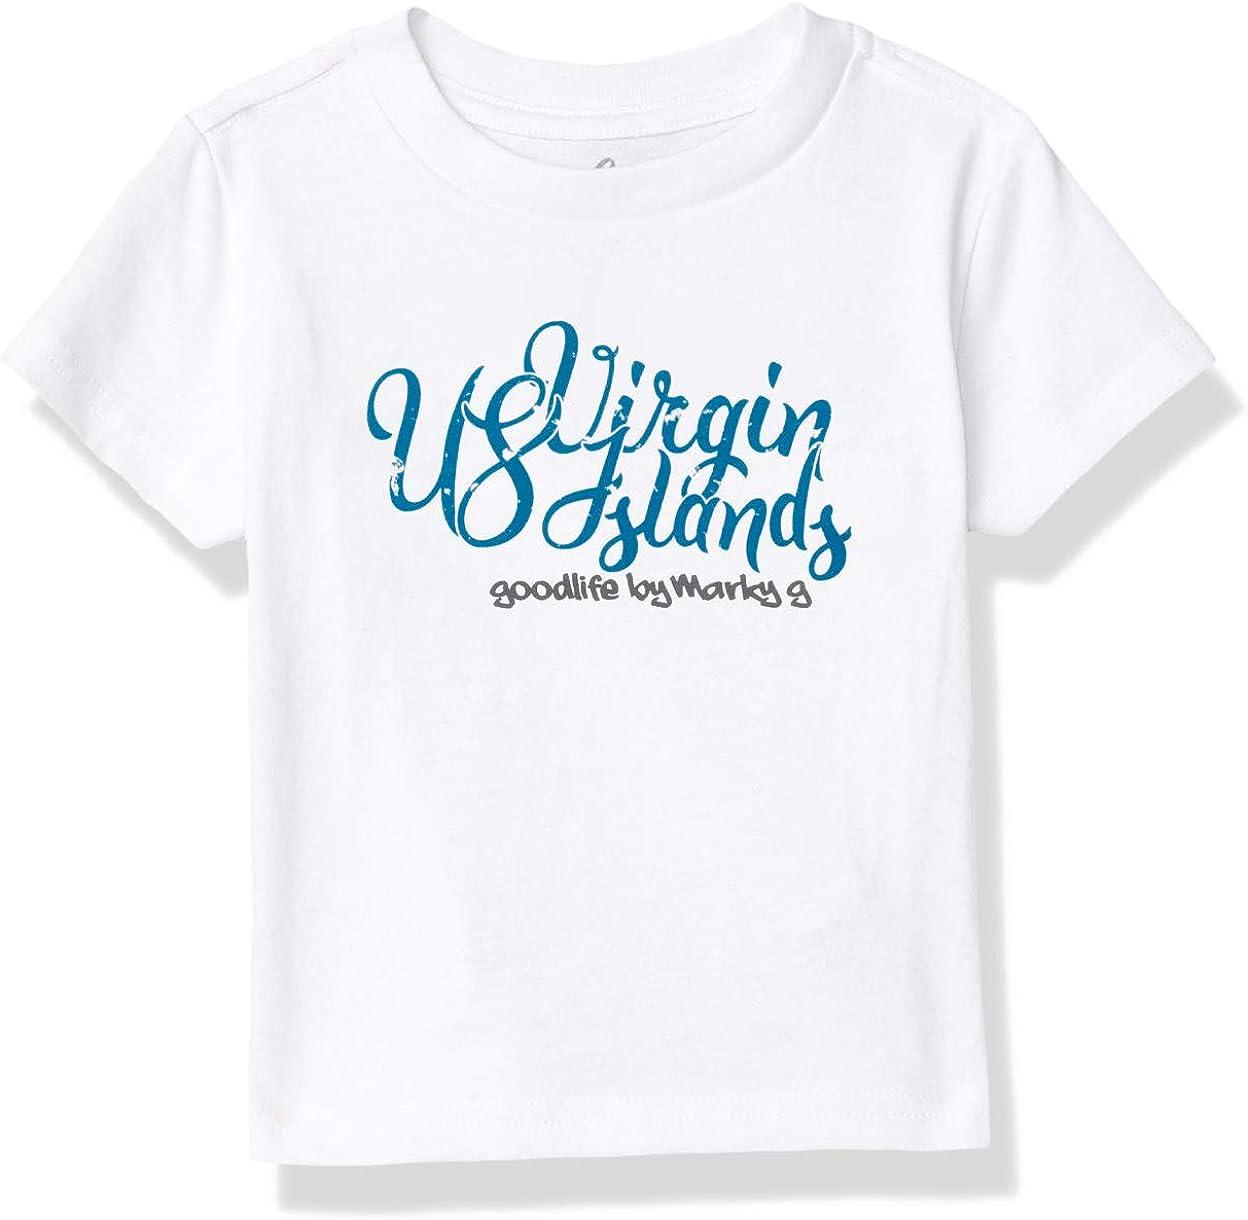 Marky G Apparel Boys' Printed U.s. Virgin Islands Graphic Cotton Jersey T-Shirt